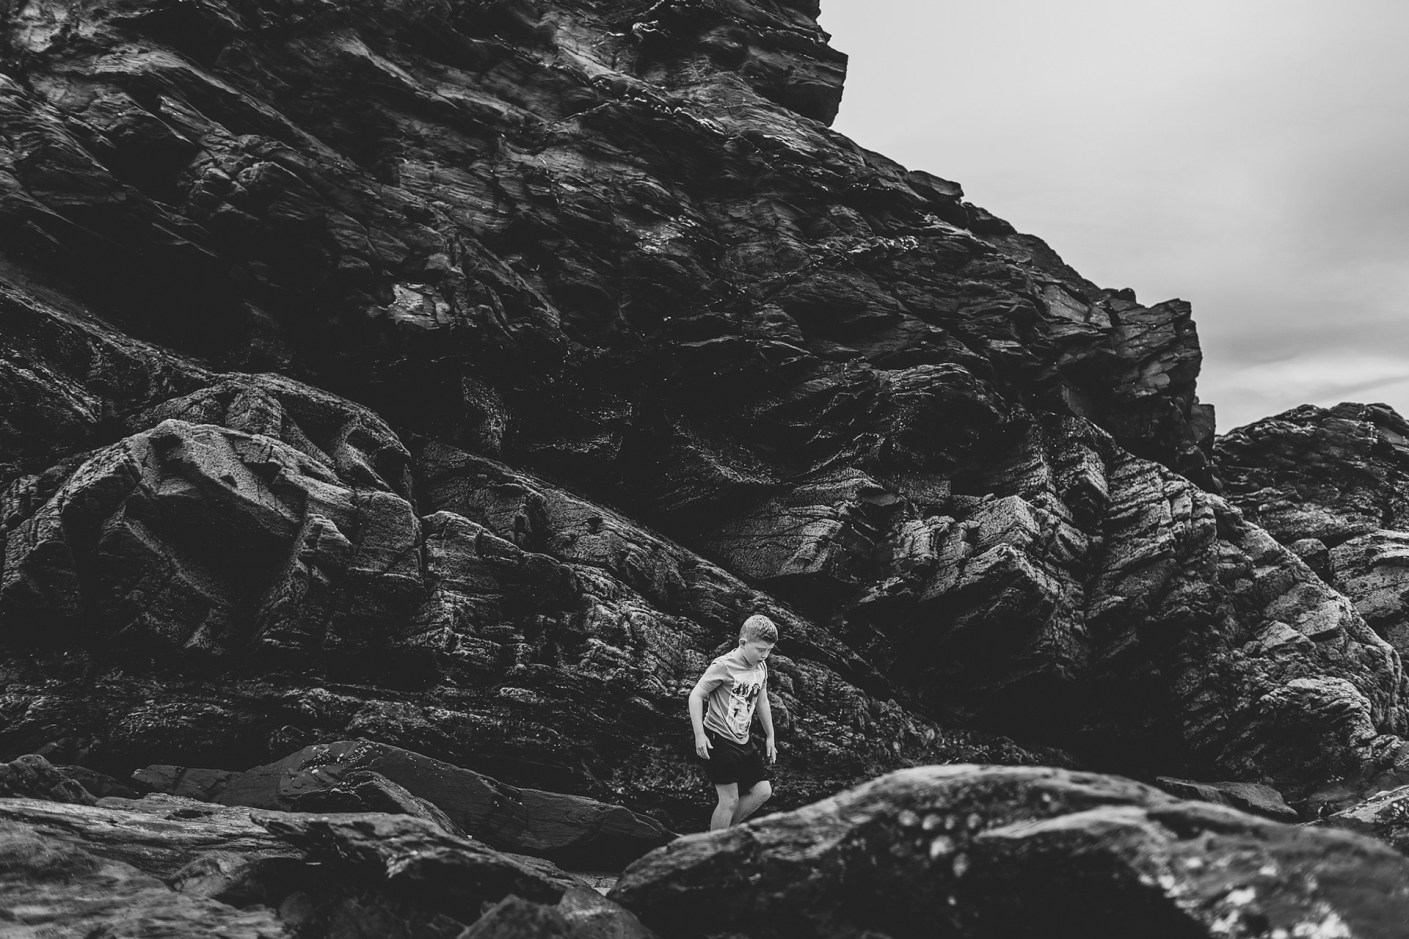 ben on the rocks